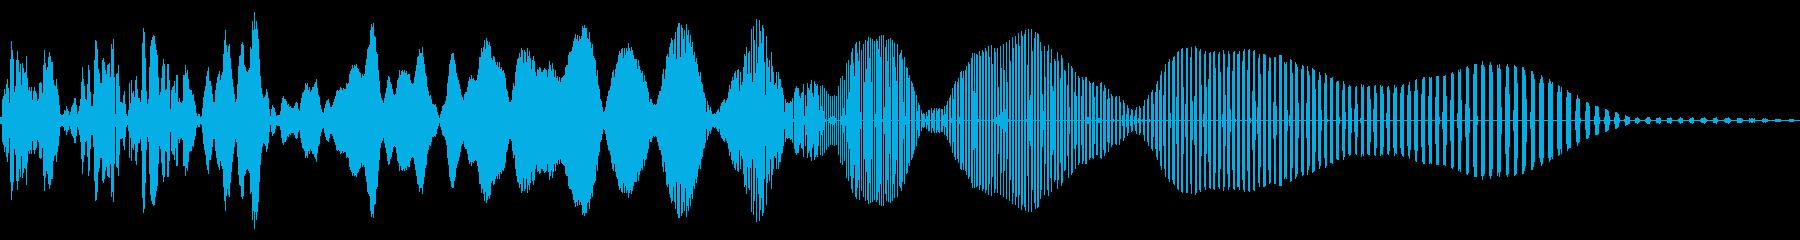 VINTAGE ELECTRONI...の再生済みの波形